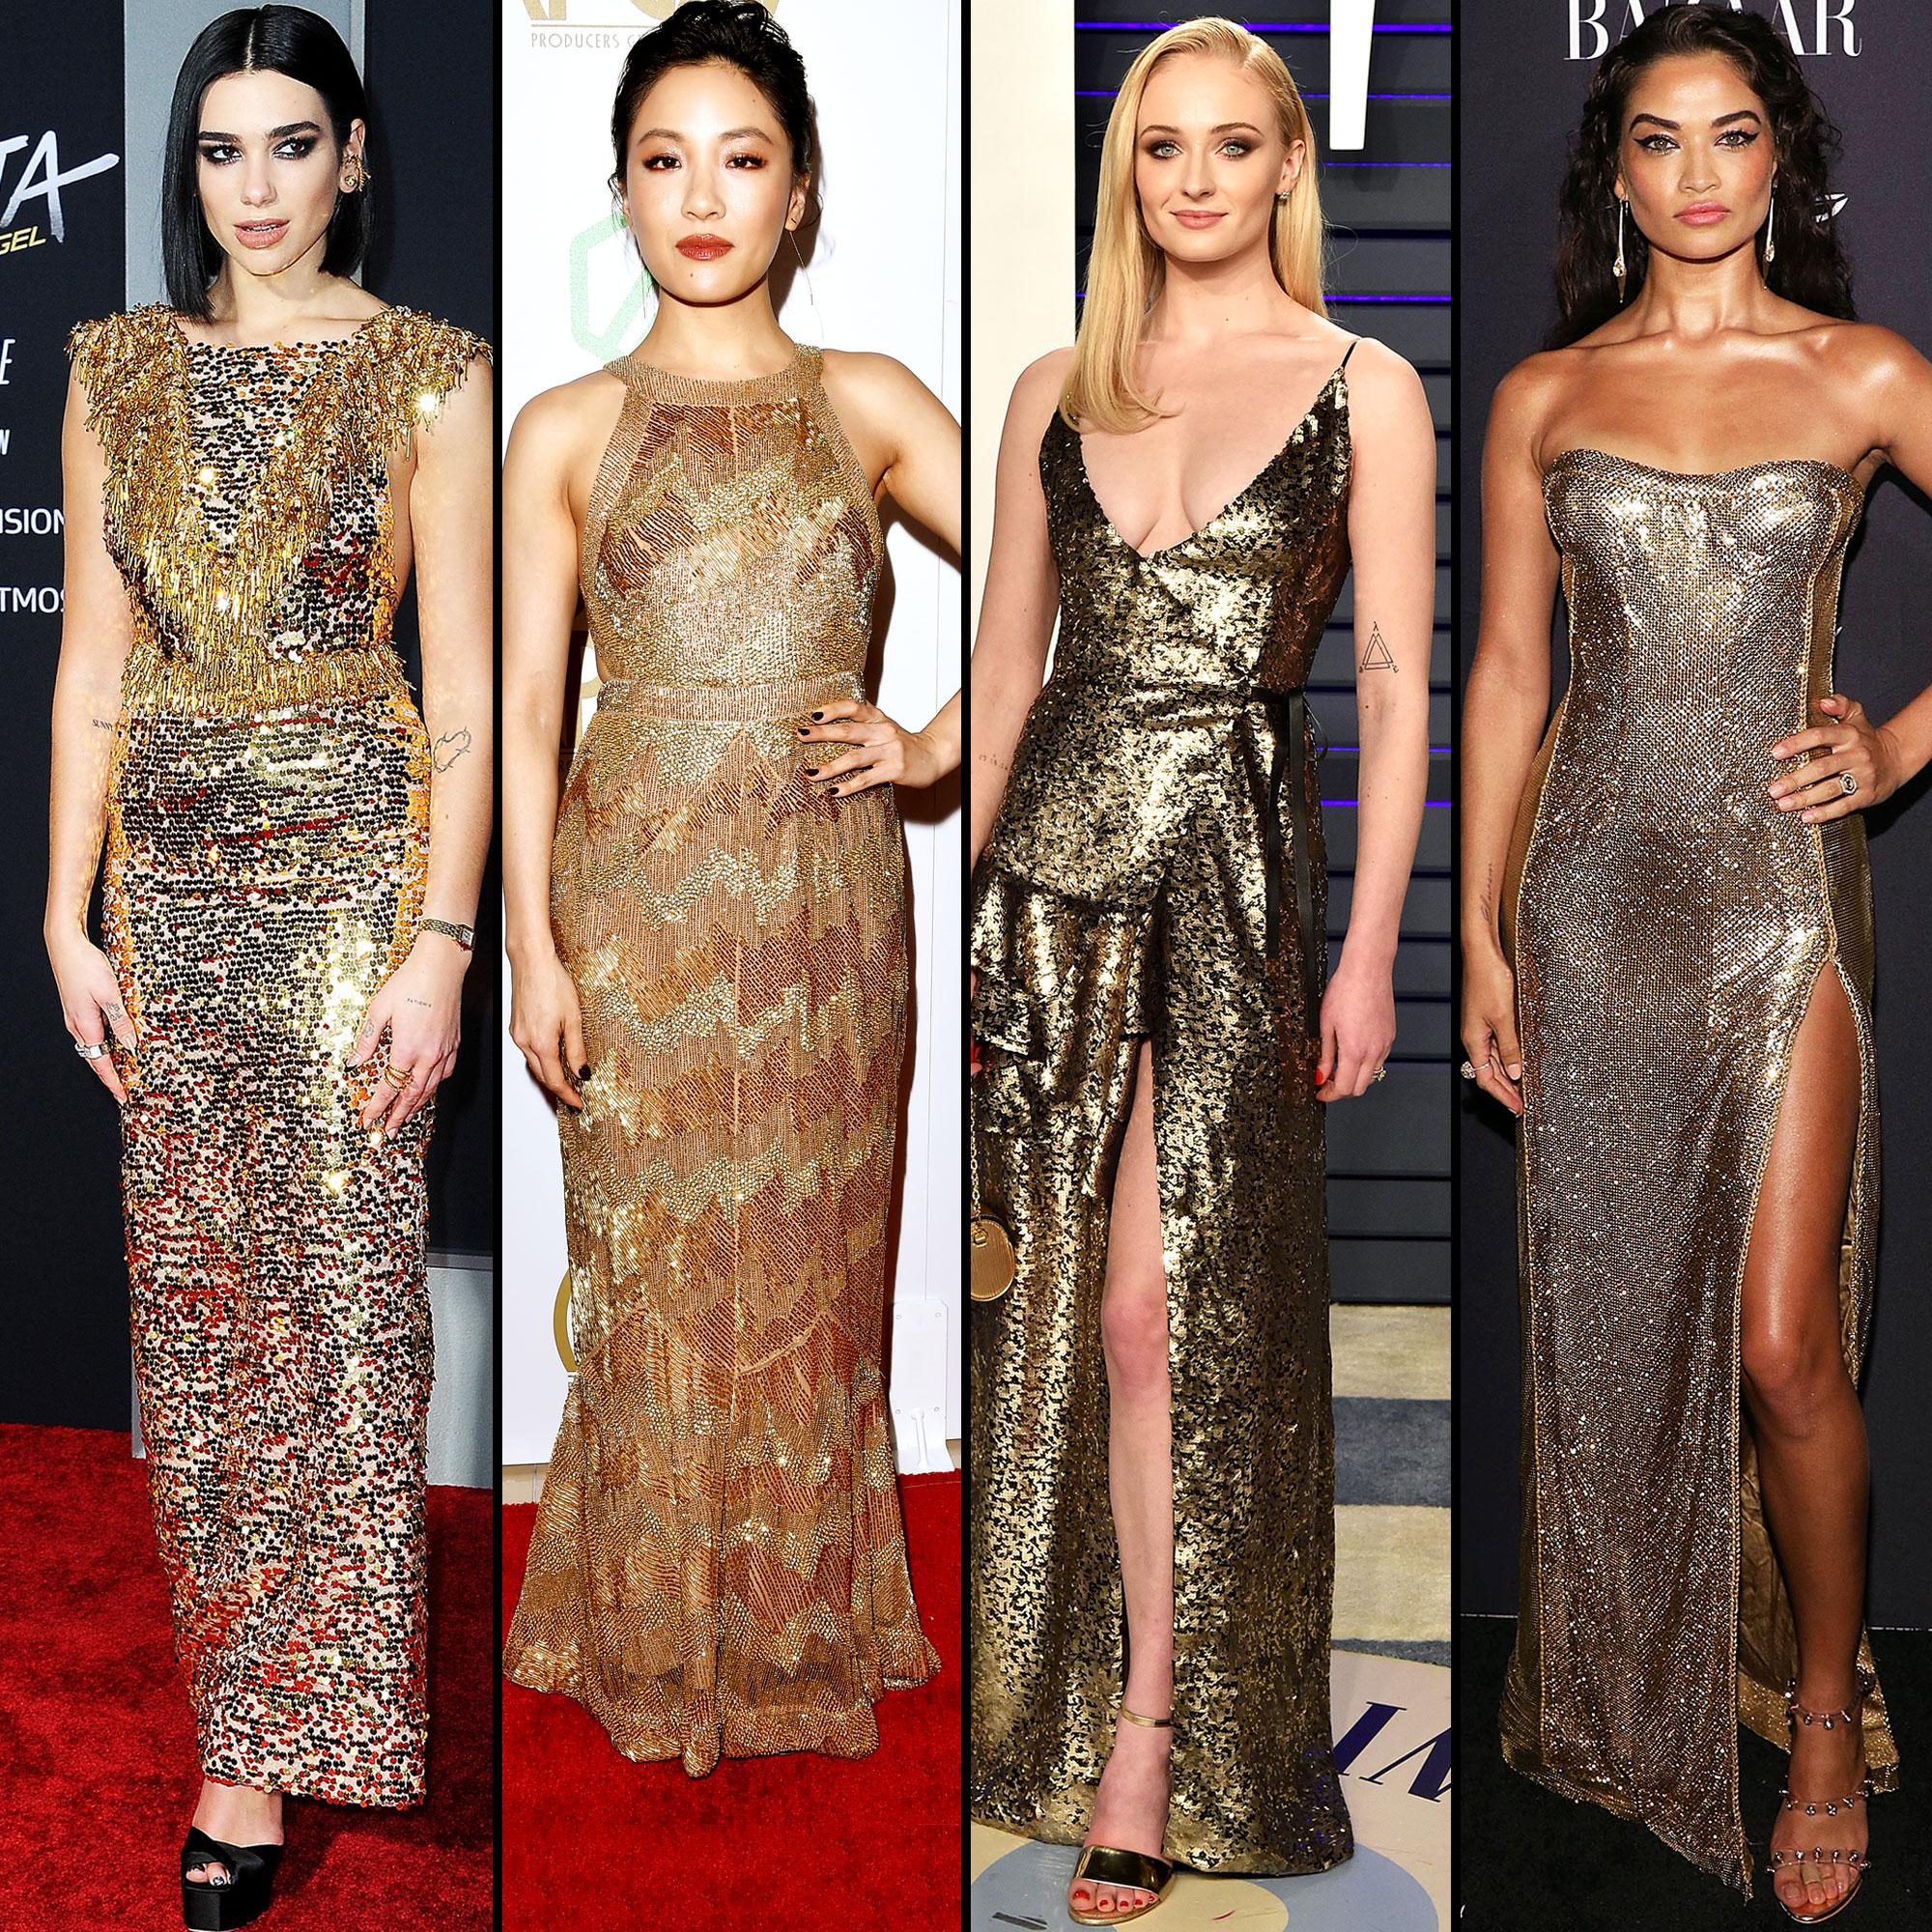 stylish gold Dua Lipa, Constance Wu, Sophie Turner, and Shanina Shaik - Dua Lipa, Constance Wu, Sophie Turner, and Shanina Shaik